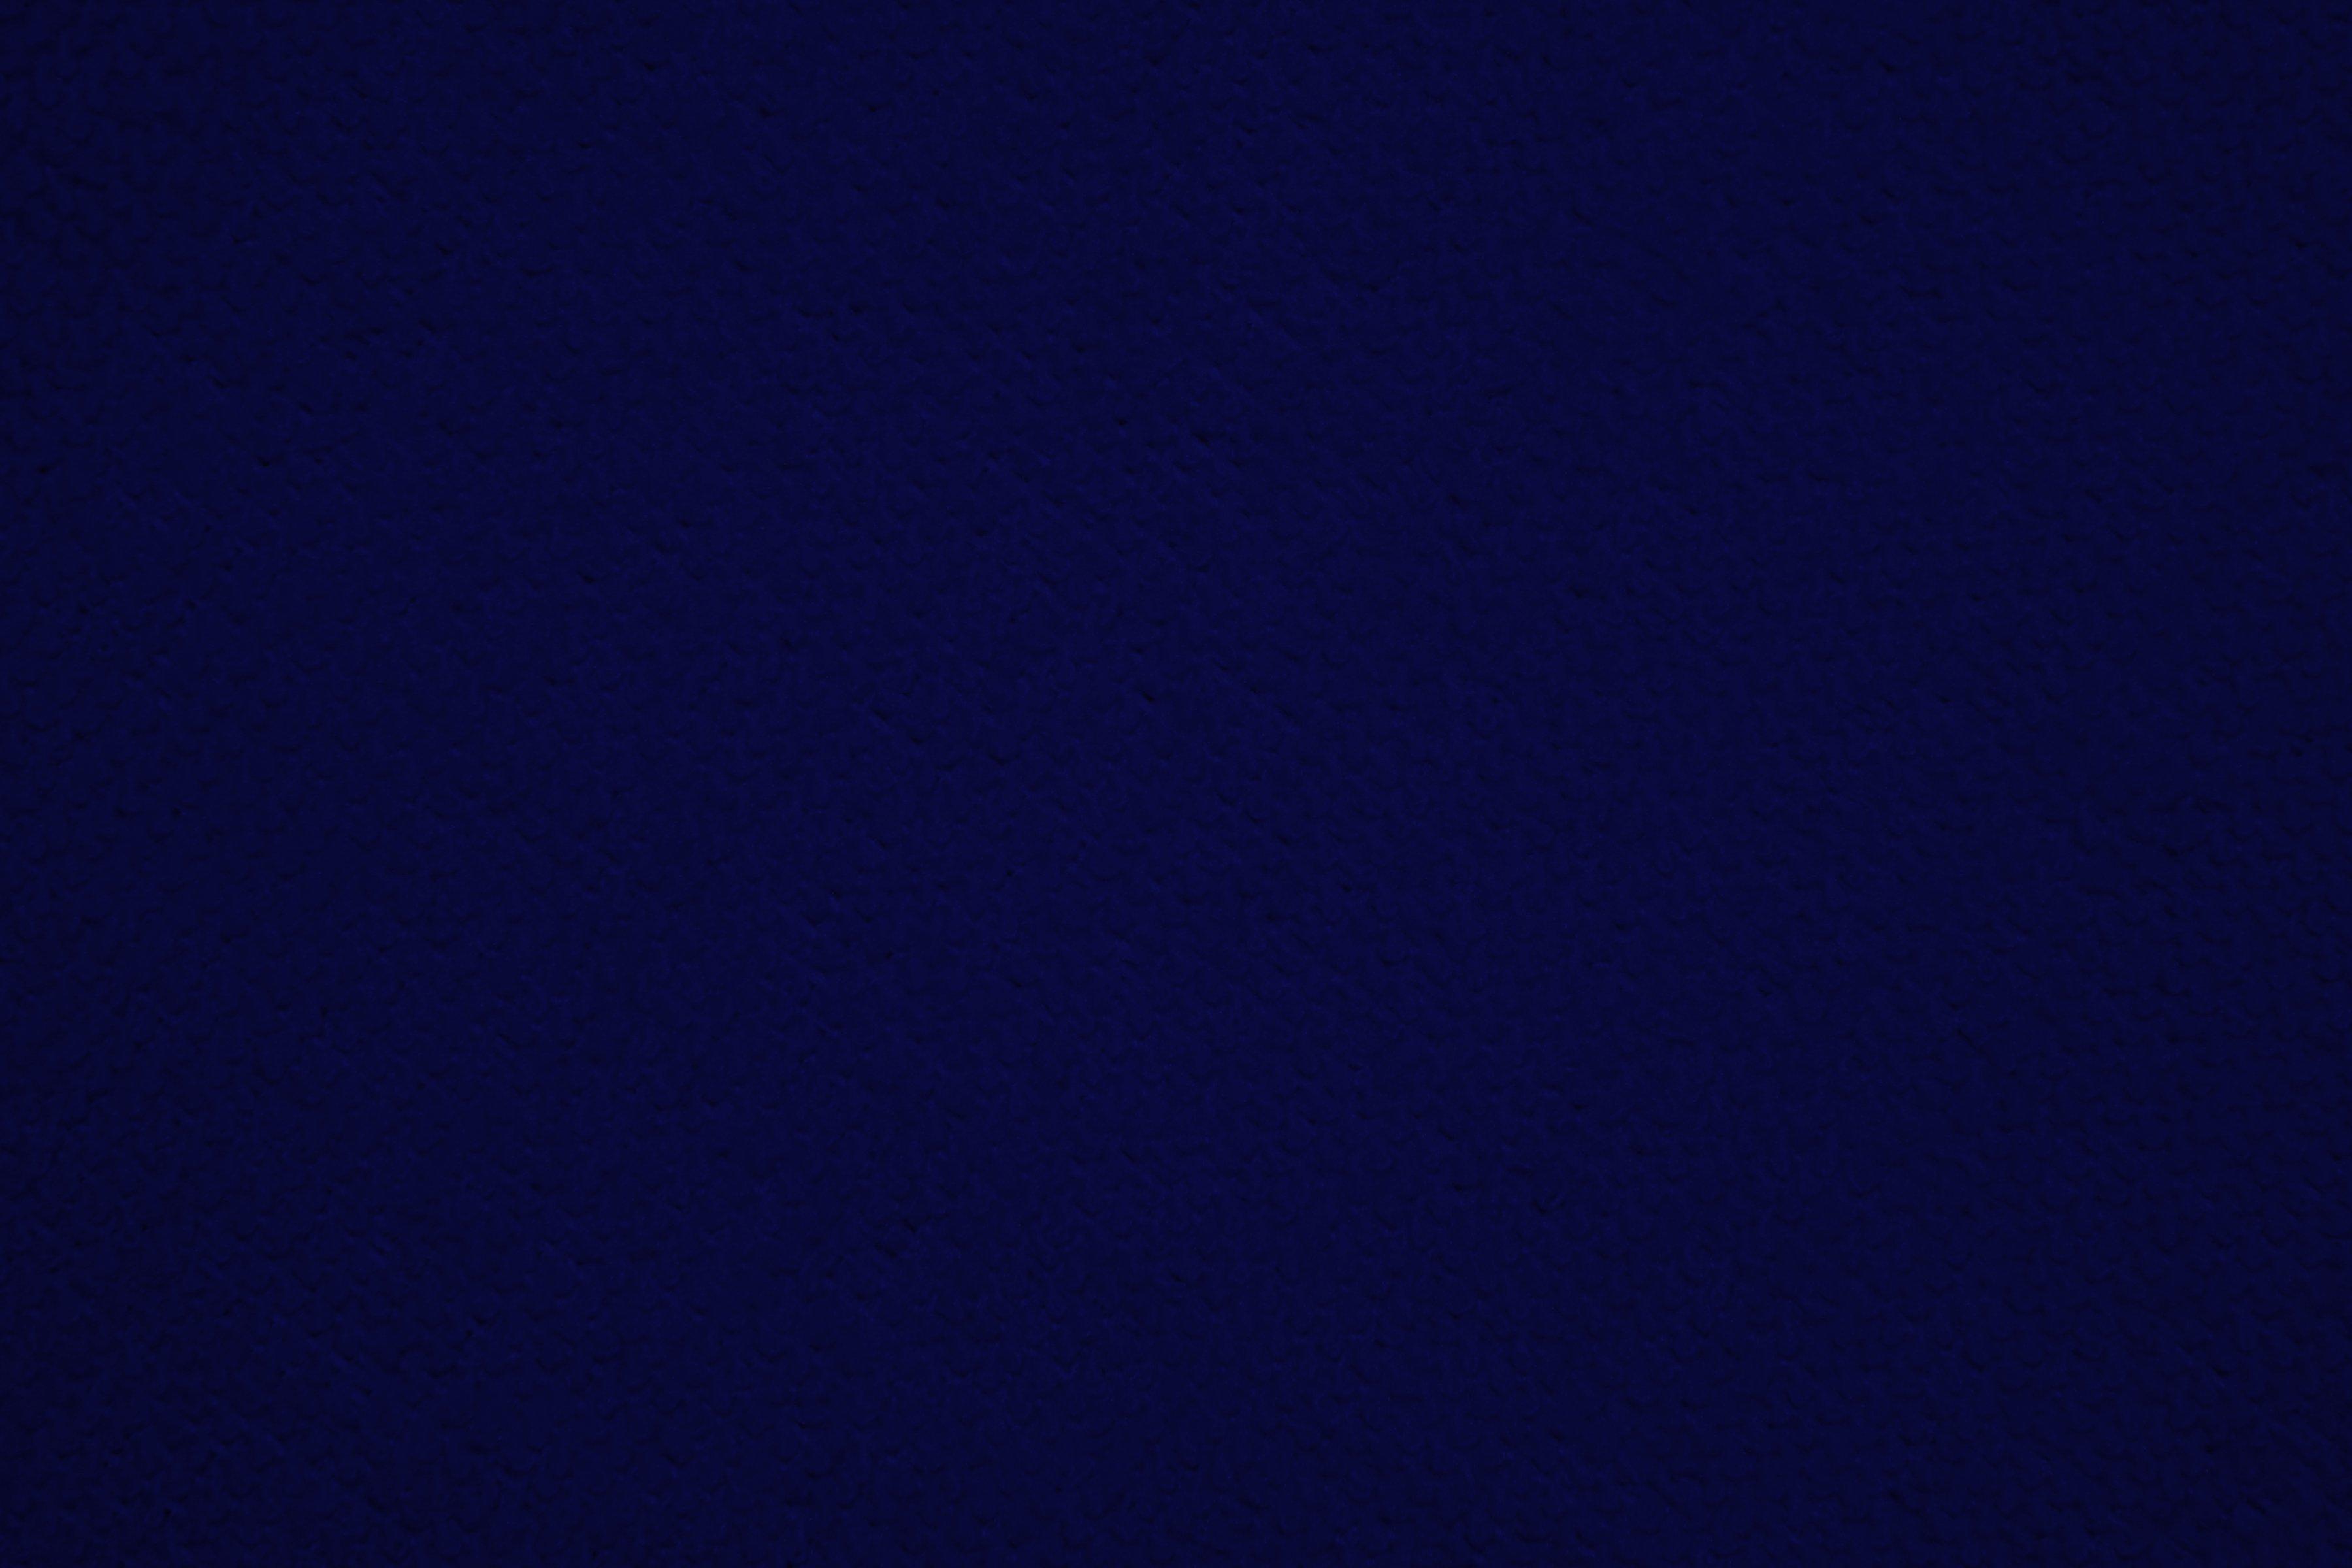 Navy Blue Background Vector Download 3600x2400